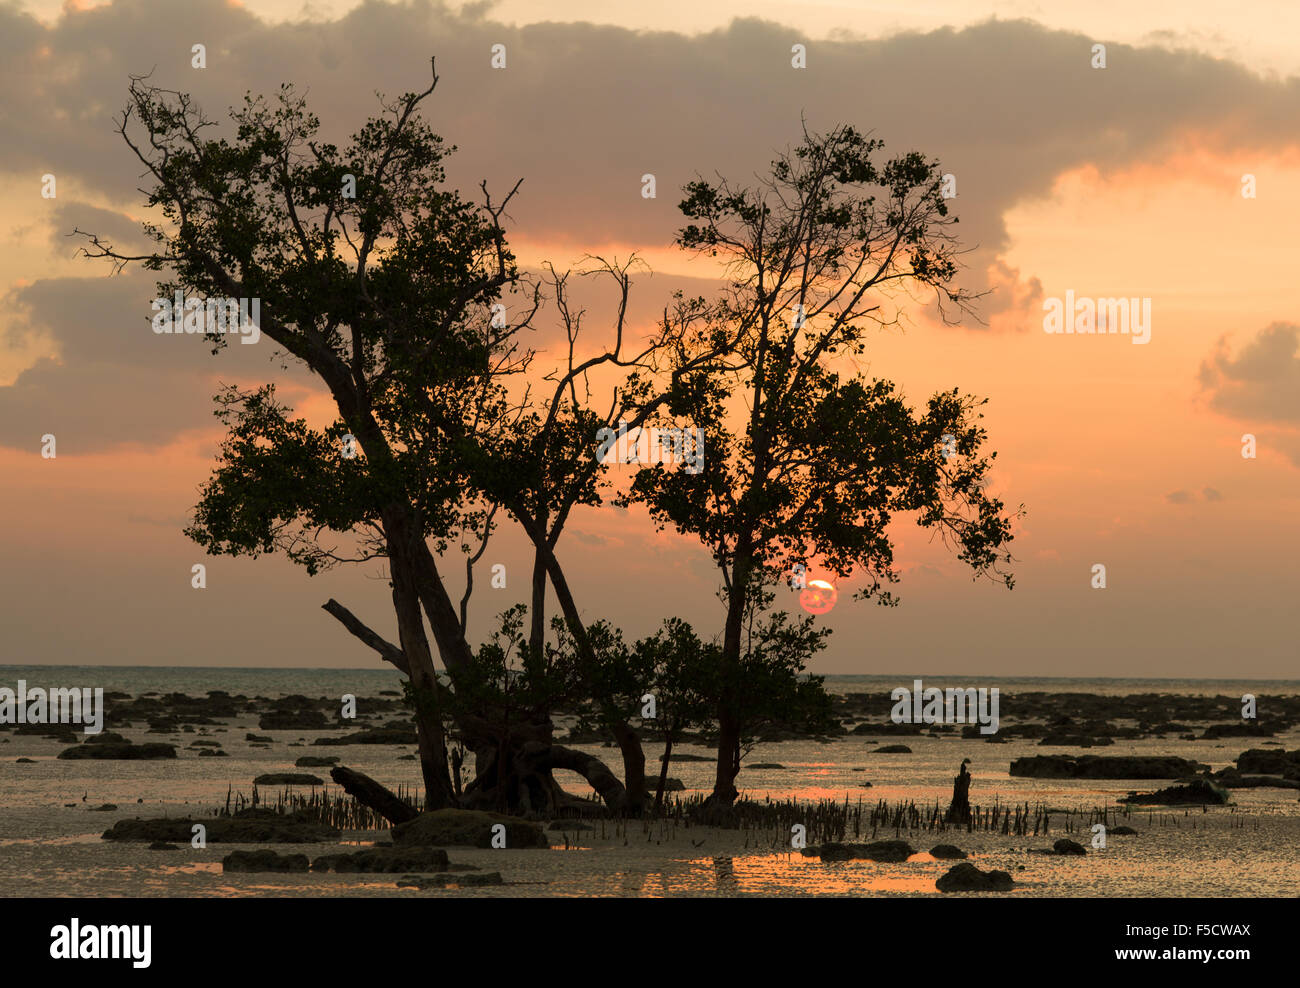 Magic sunset on Havlock island beach - Stock Image